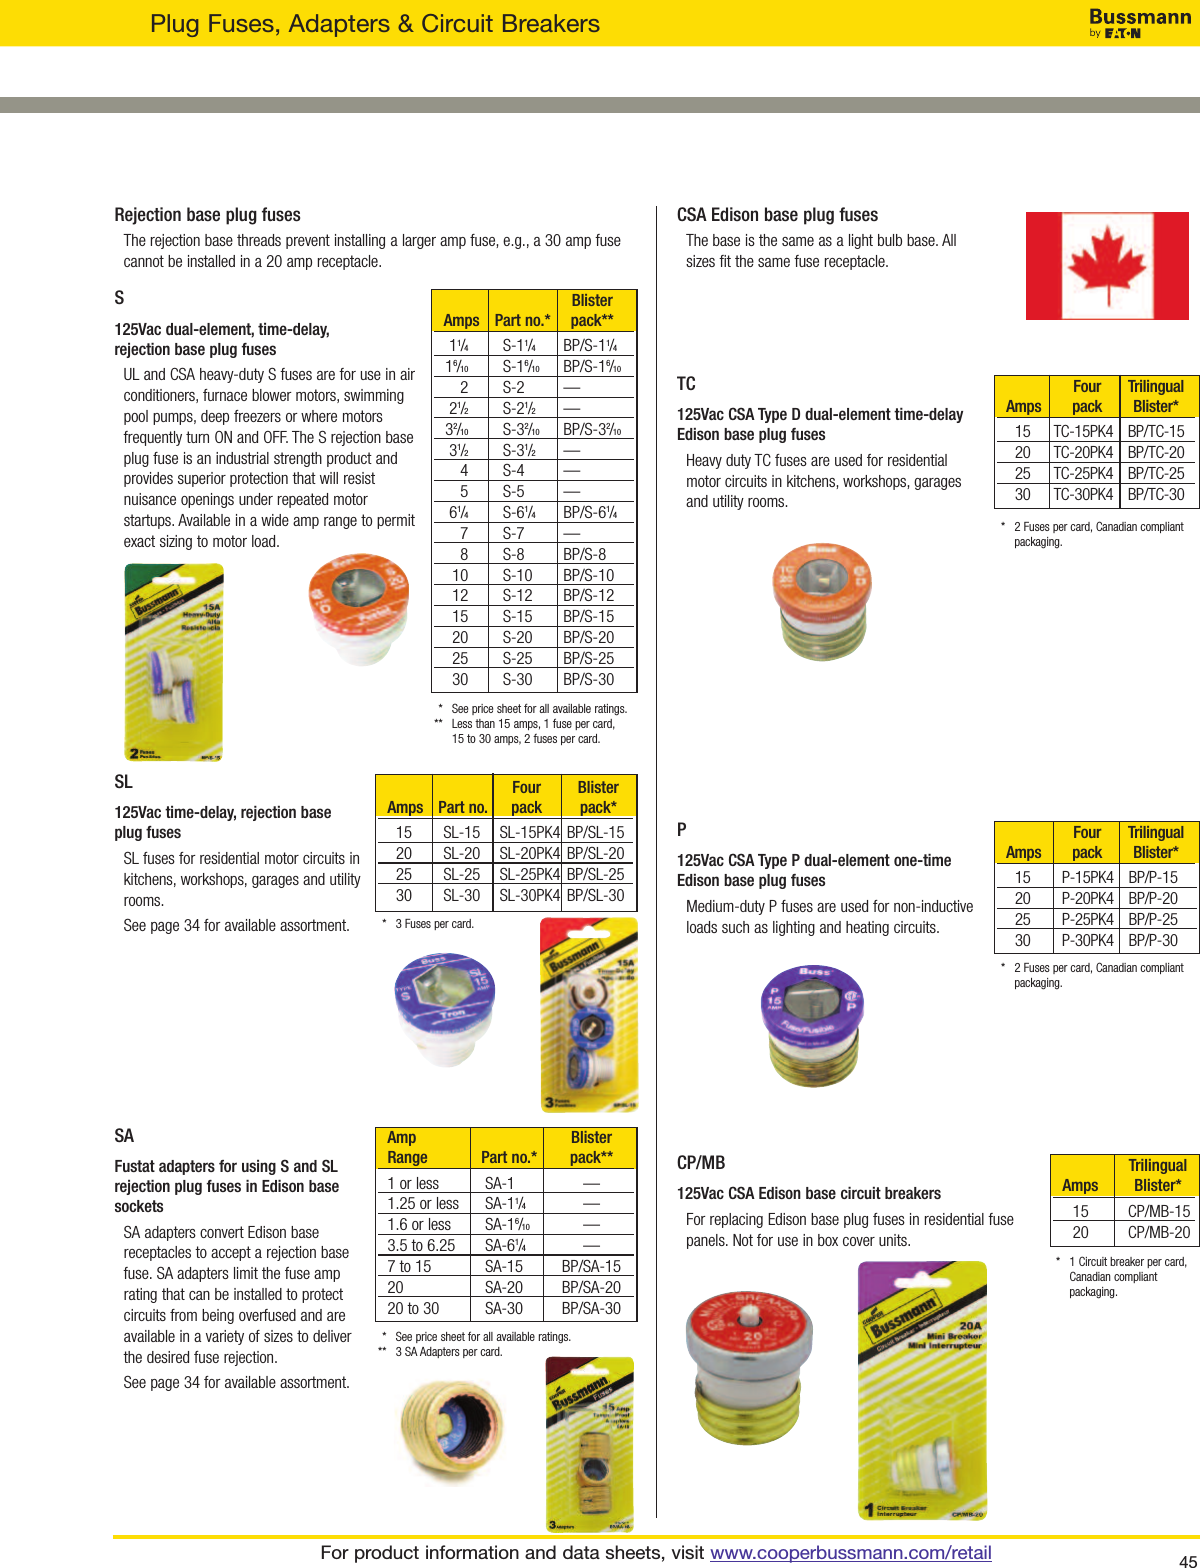 Bussmann Full Line Retail Catalog # 5084 1000470846